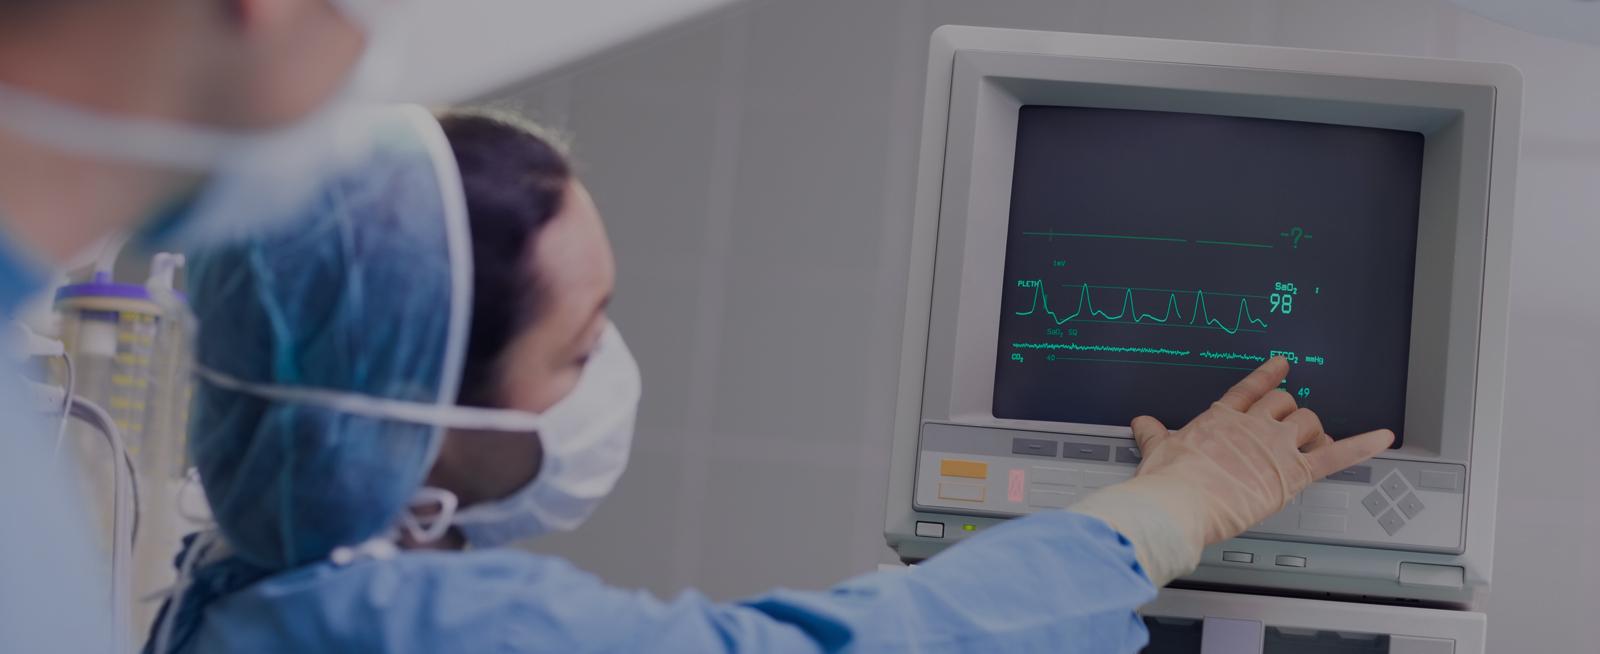 Orthopedic Surgery Residency - LECOM Health